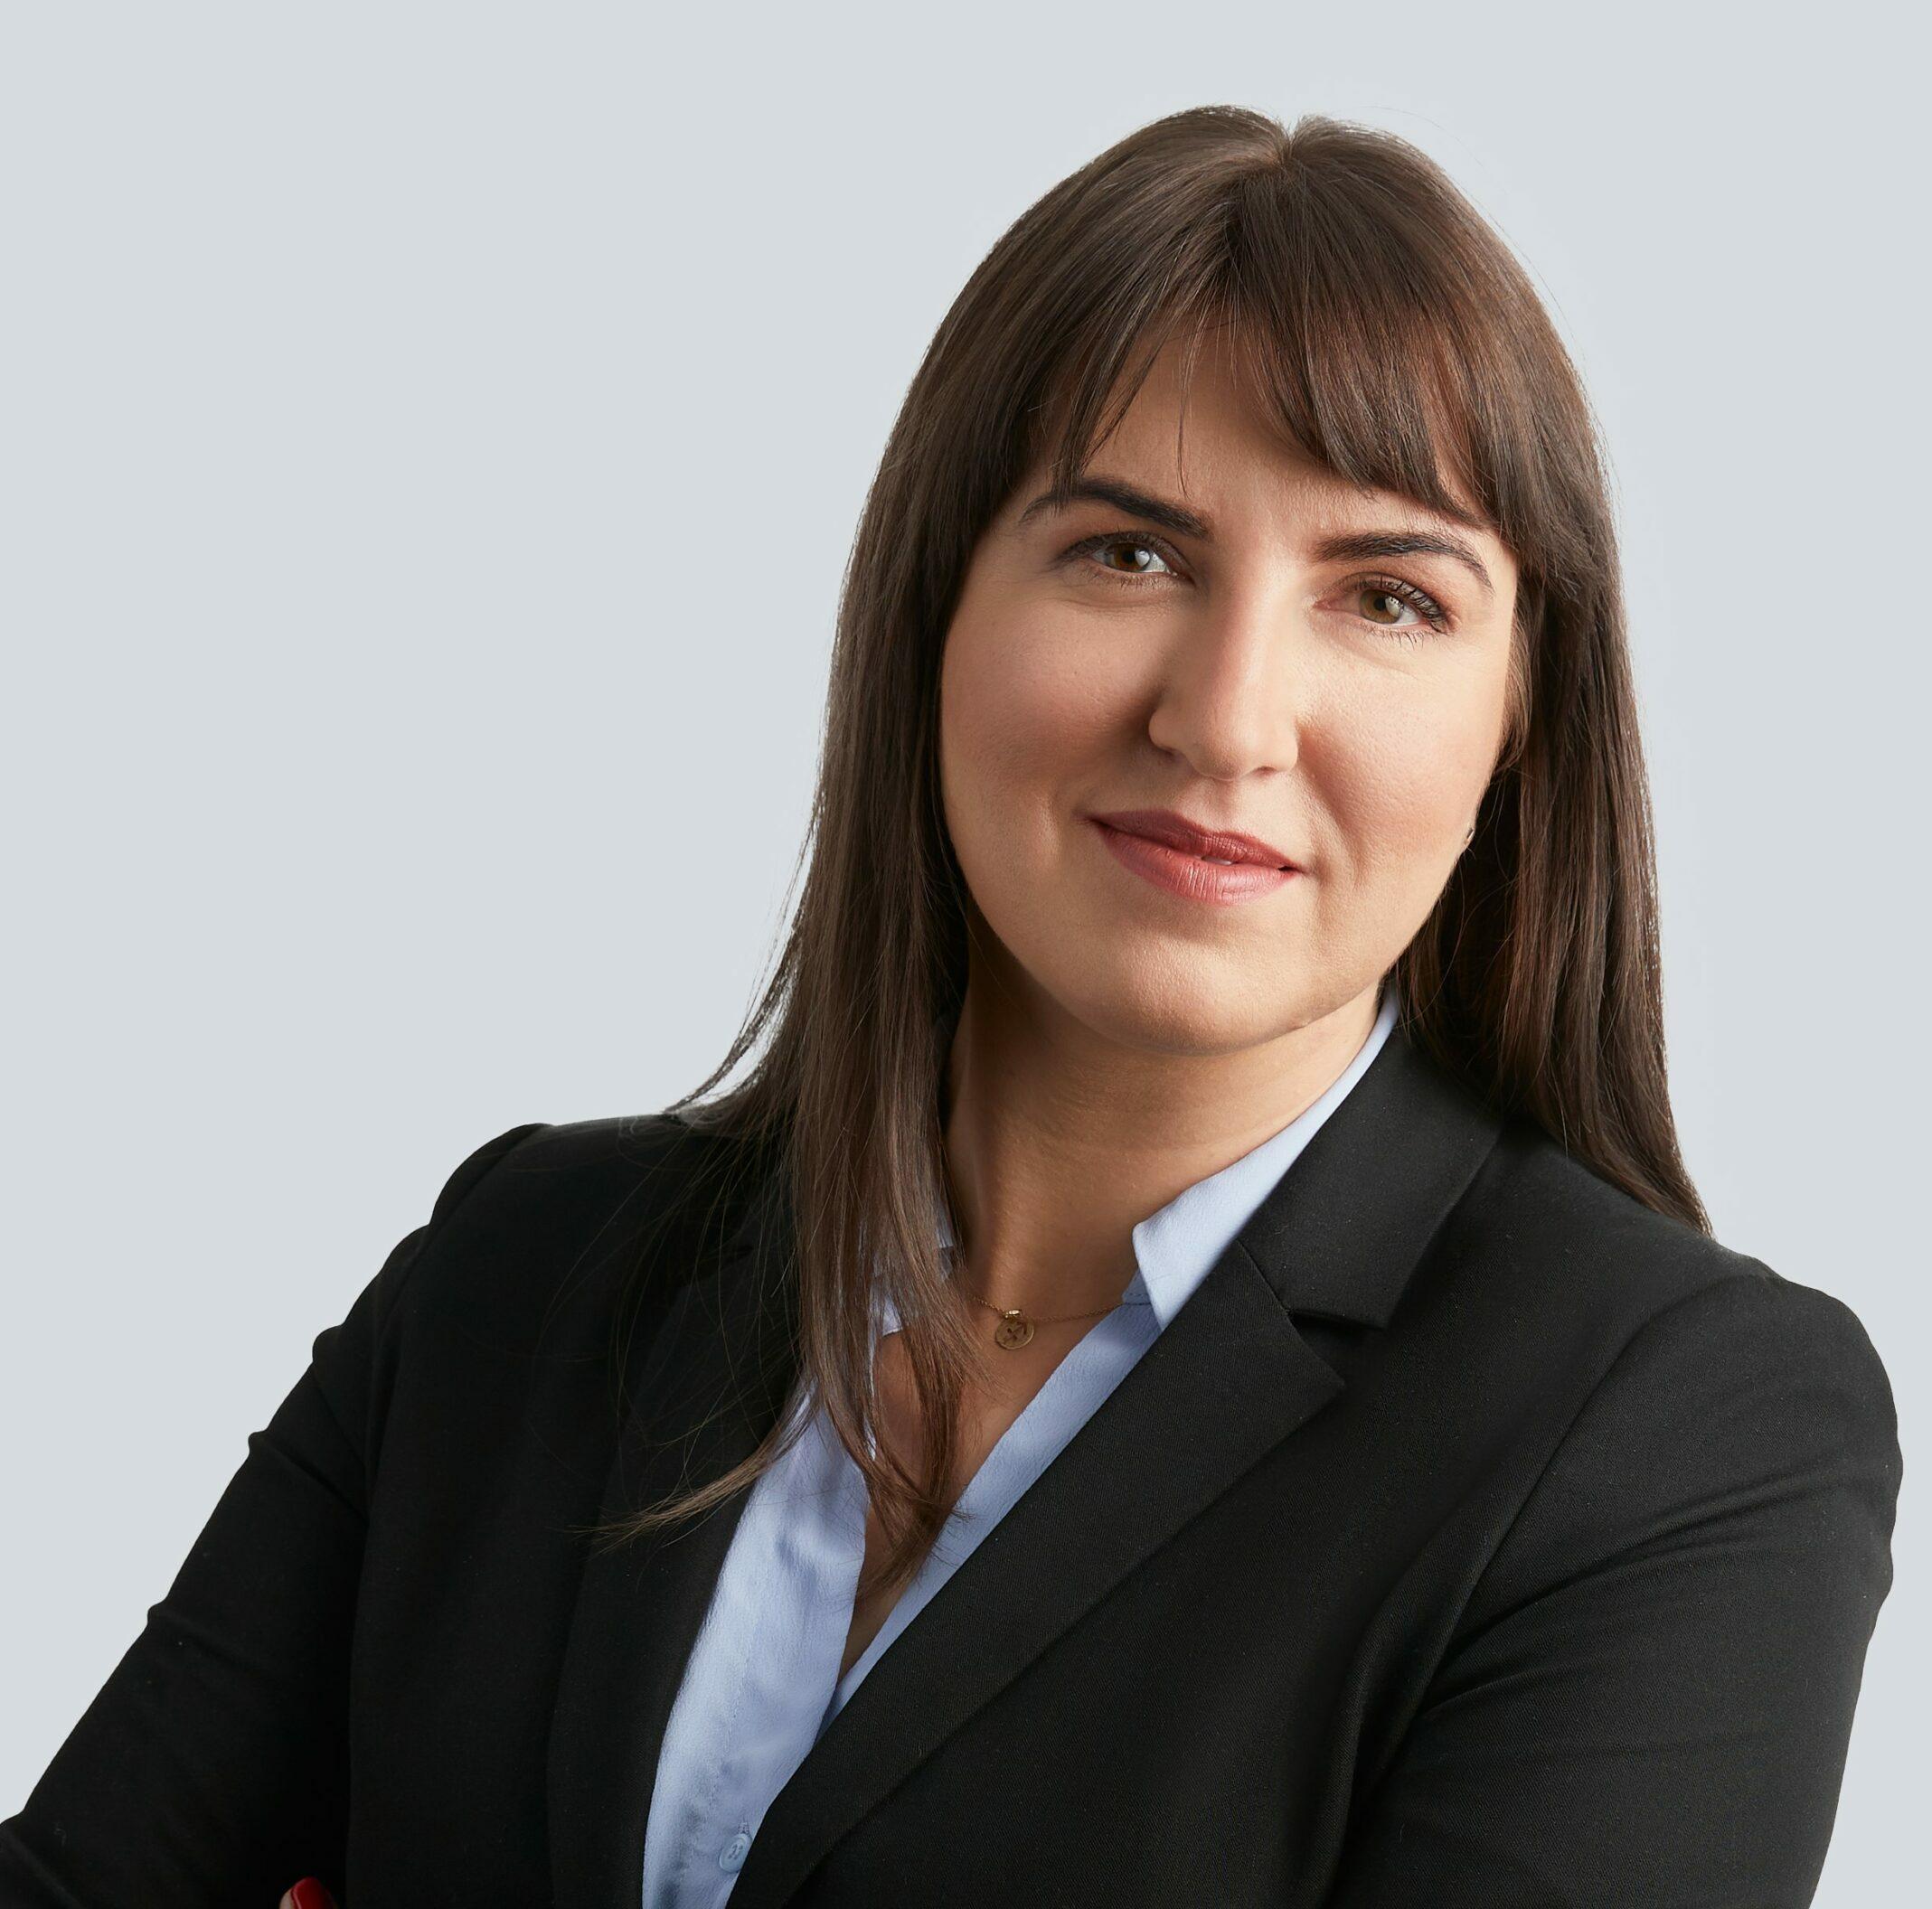 Natalia Duszynska